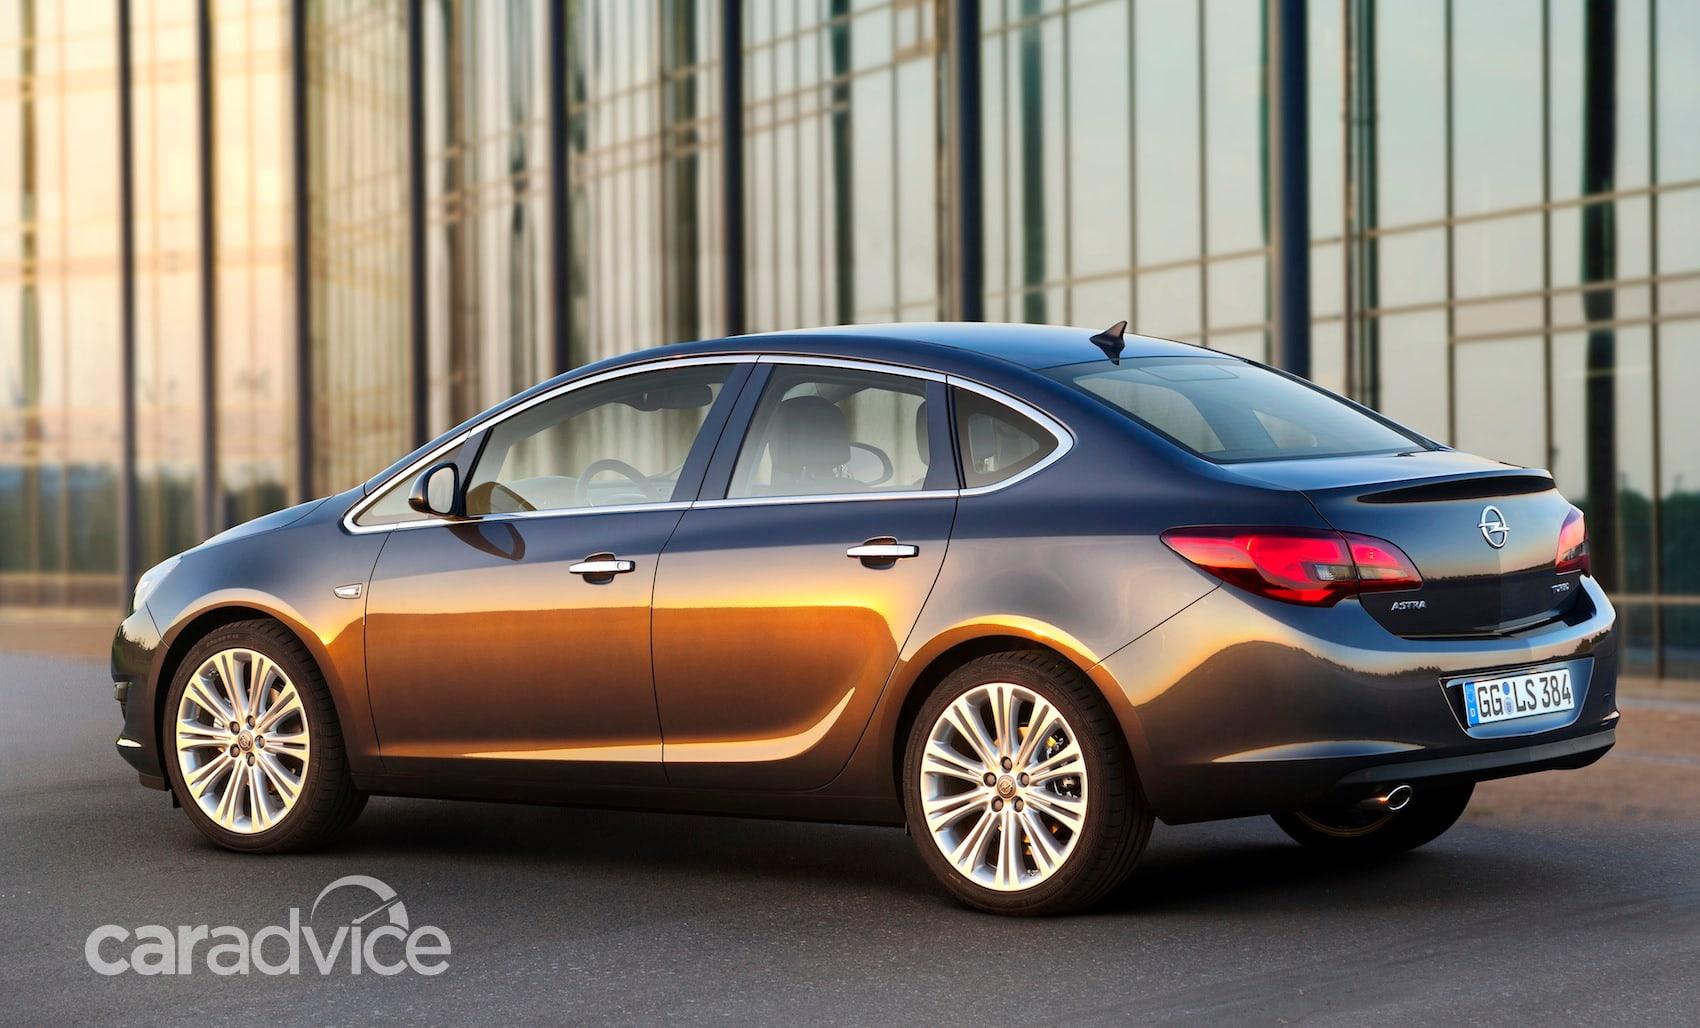 Opel Astra sedan: first look at small four-door   CarAdvice